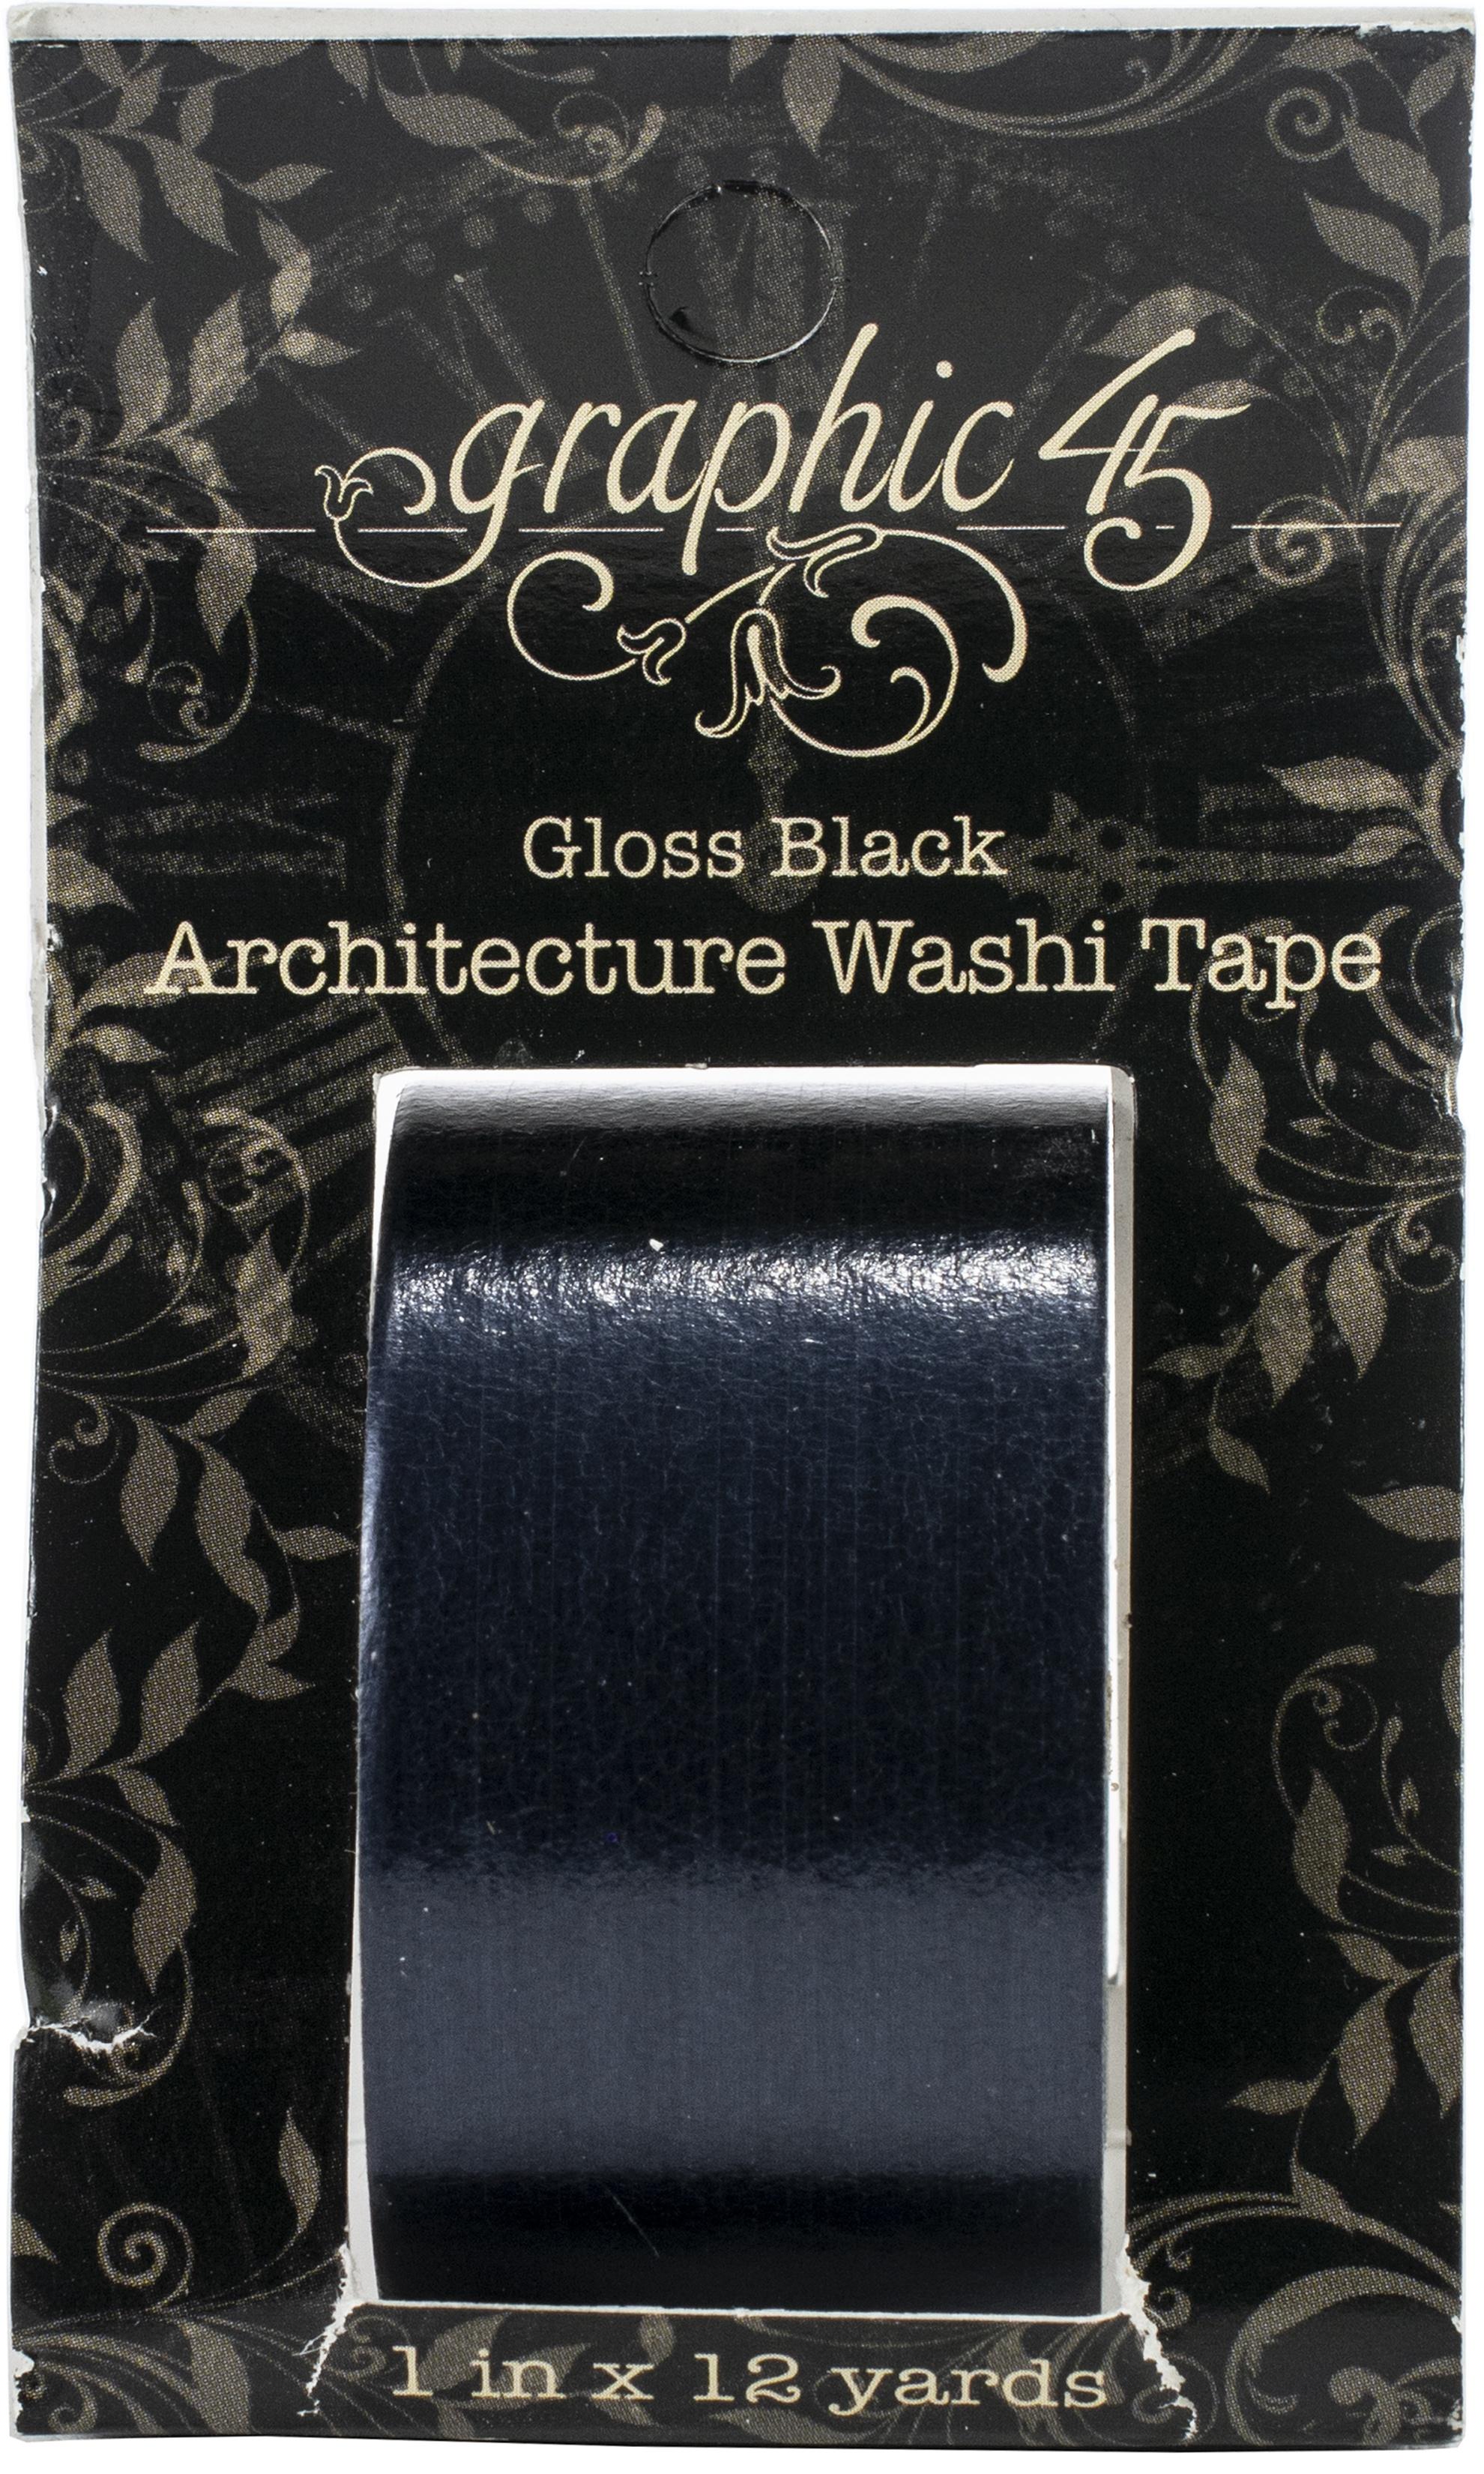 Gloss Black Washi Tape